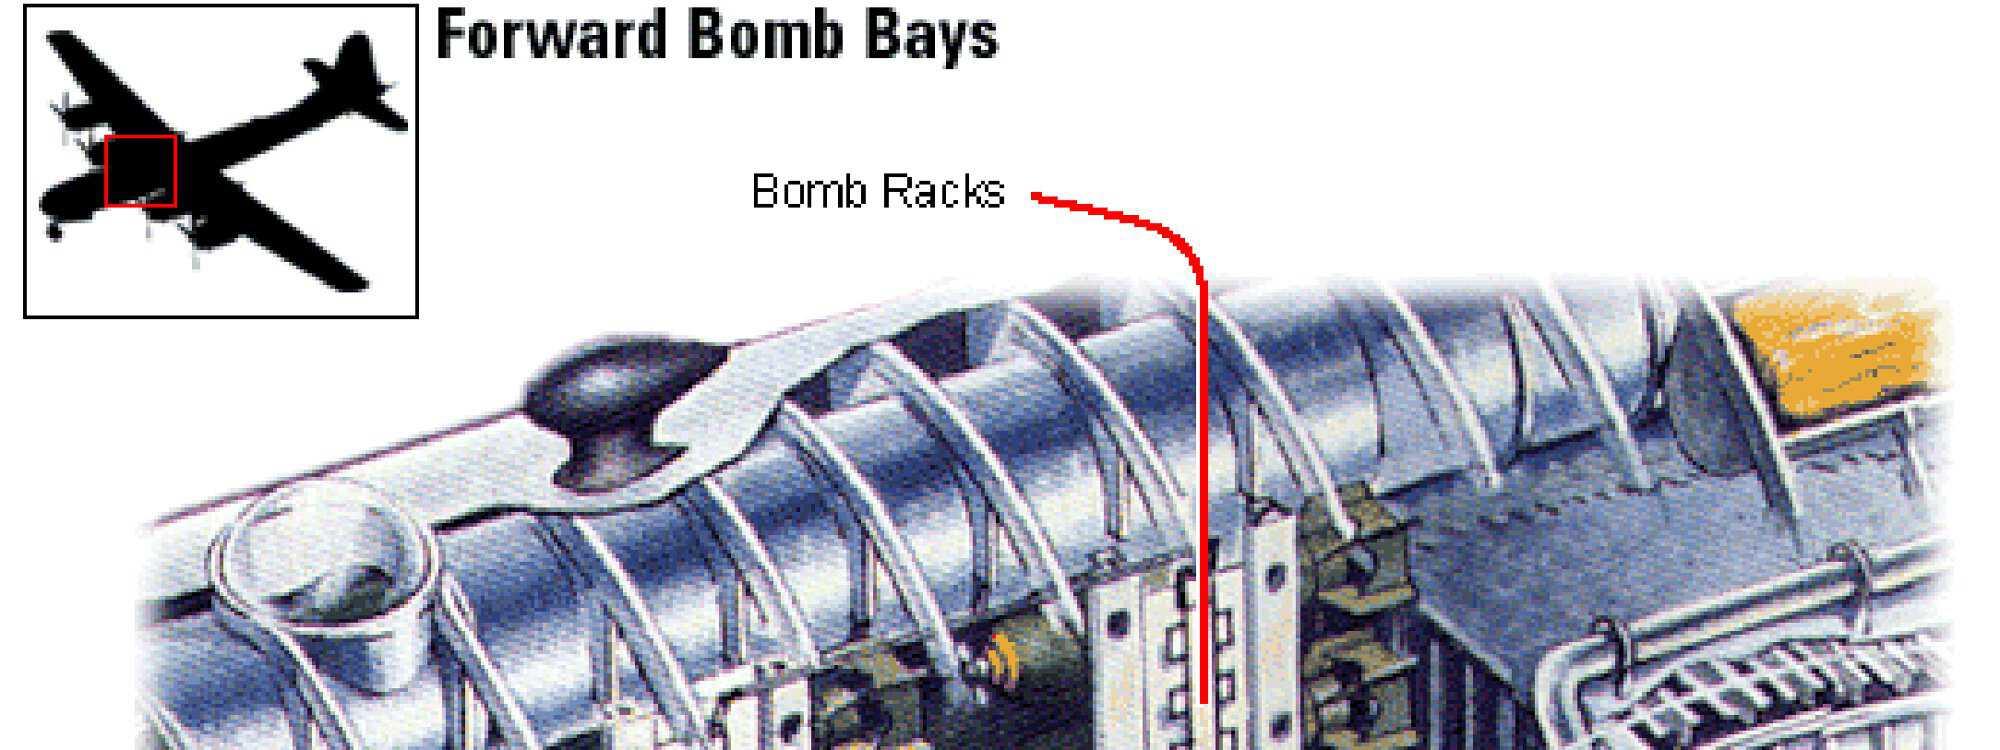 flygirls-B29-for_bomb_top.jpg